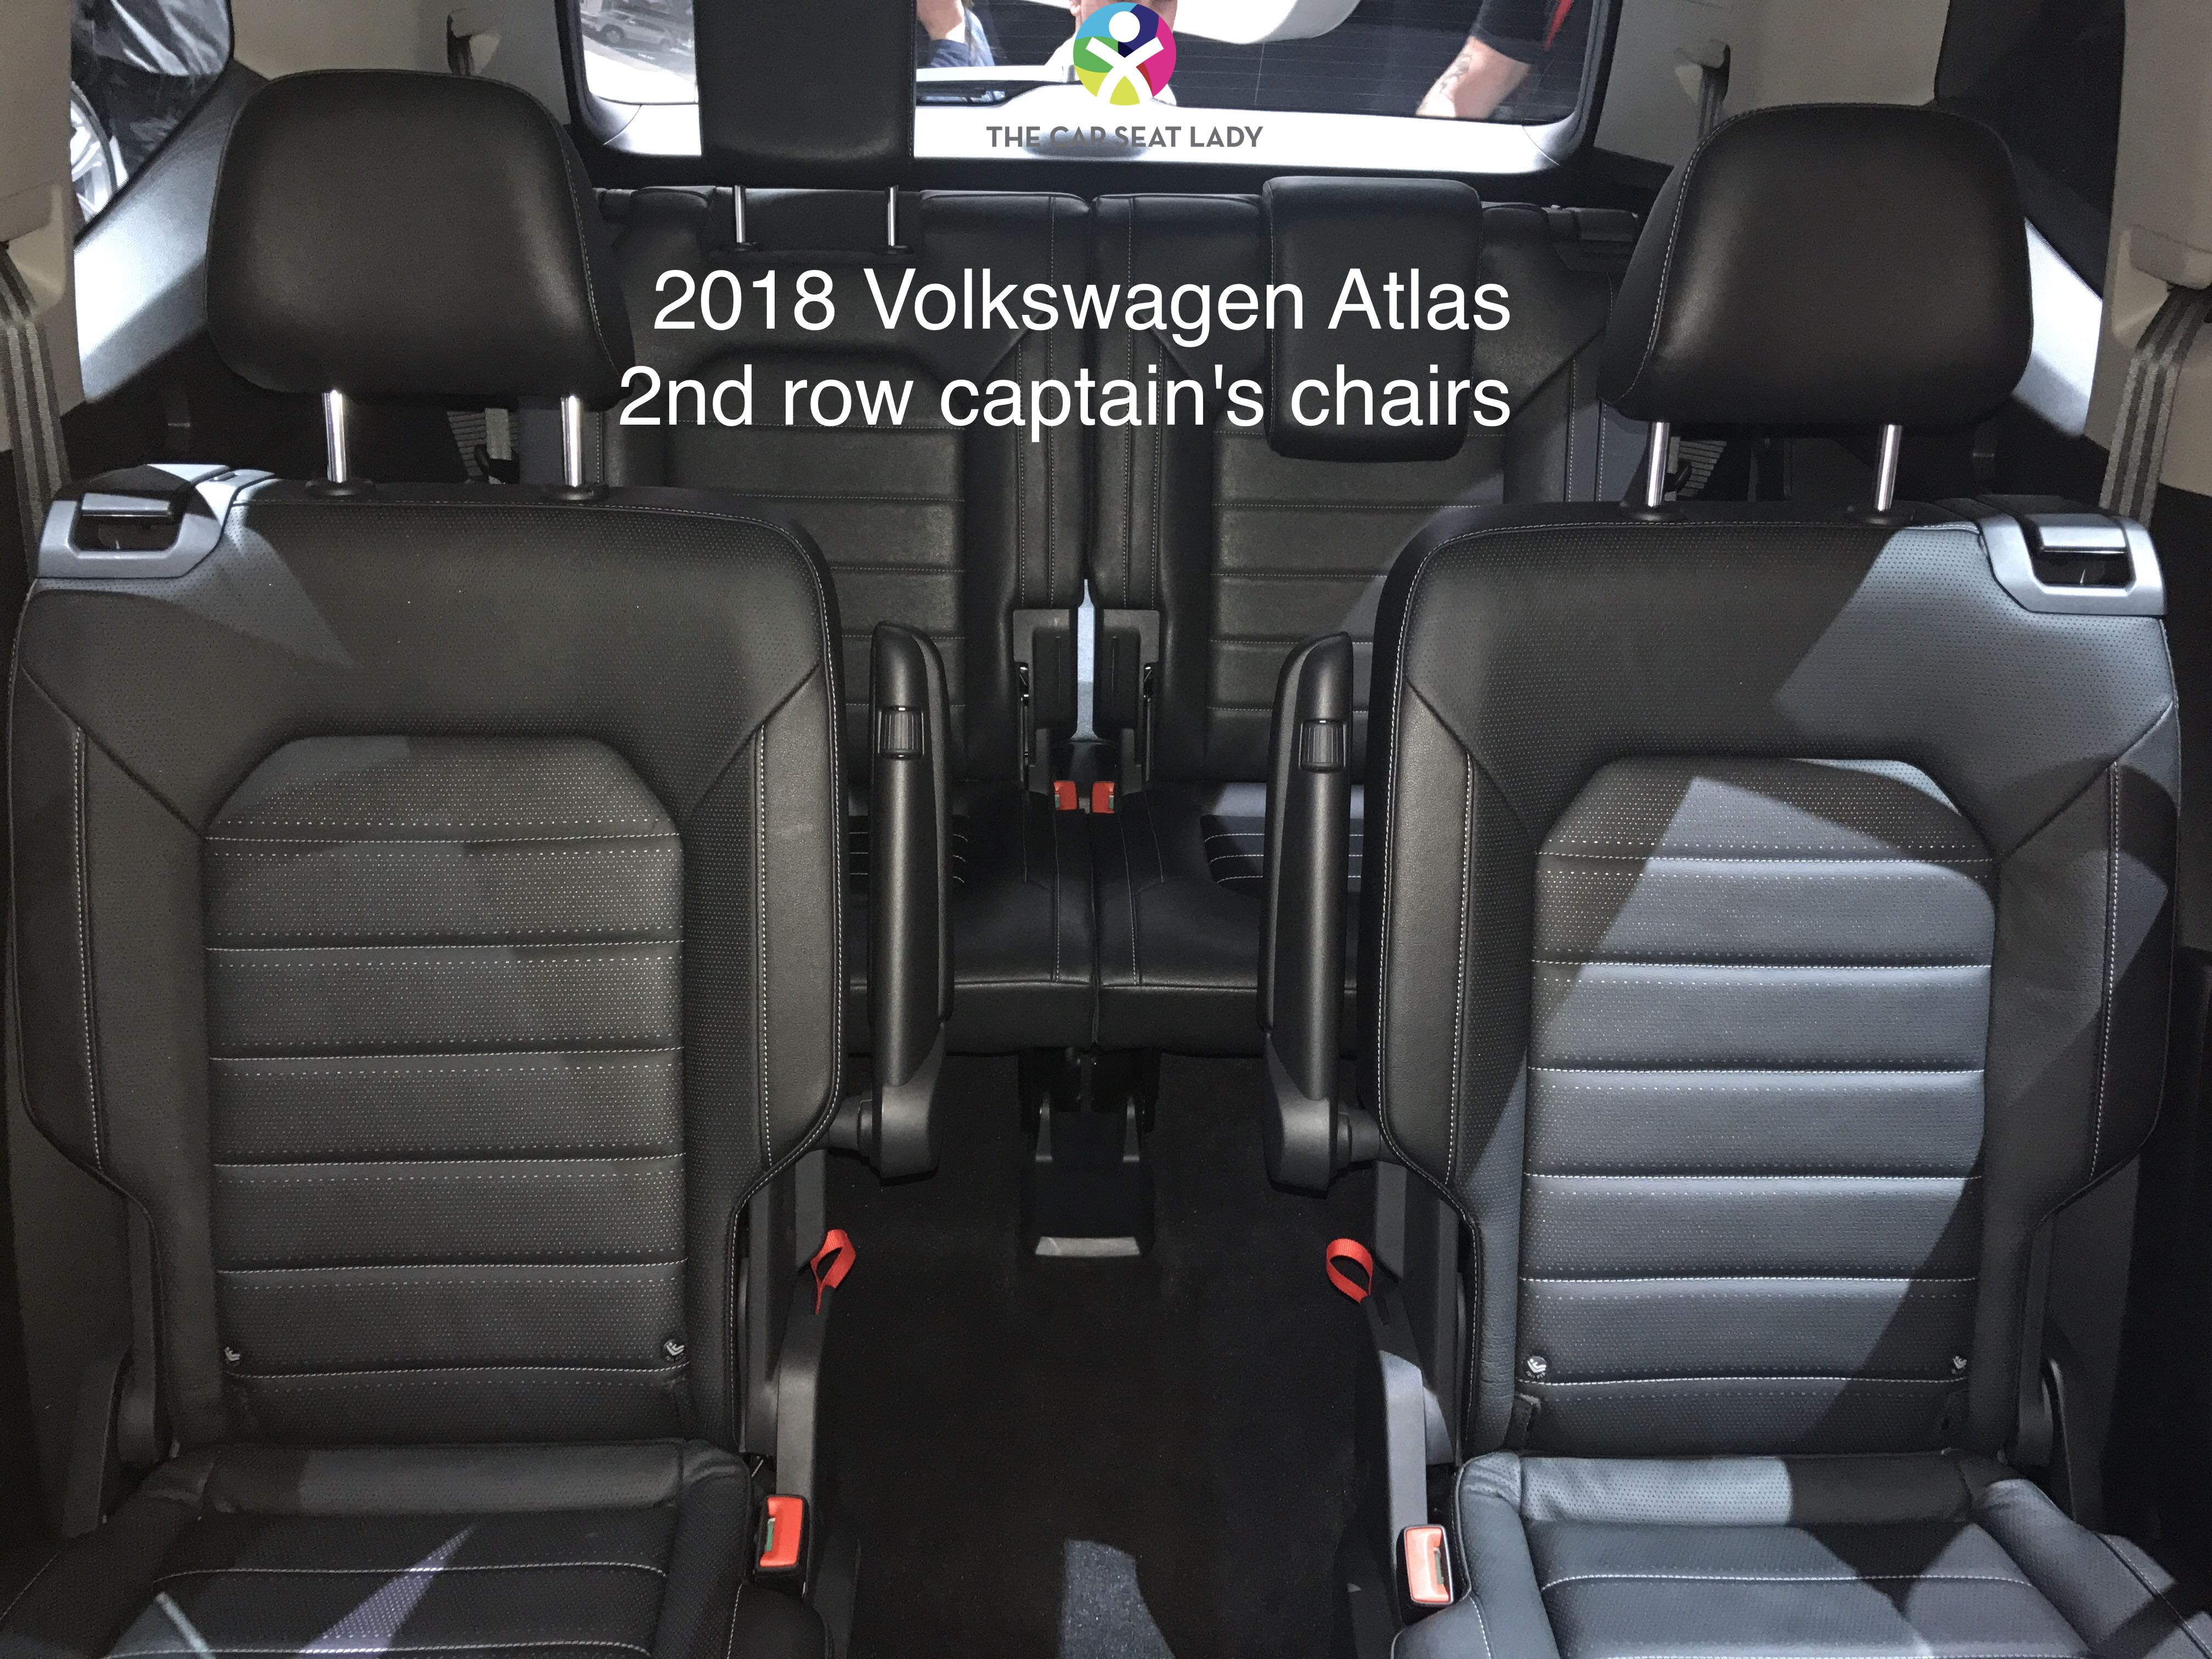 Atlas Vw Interior